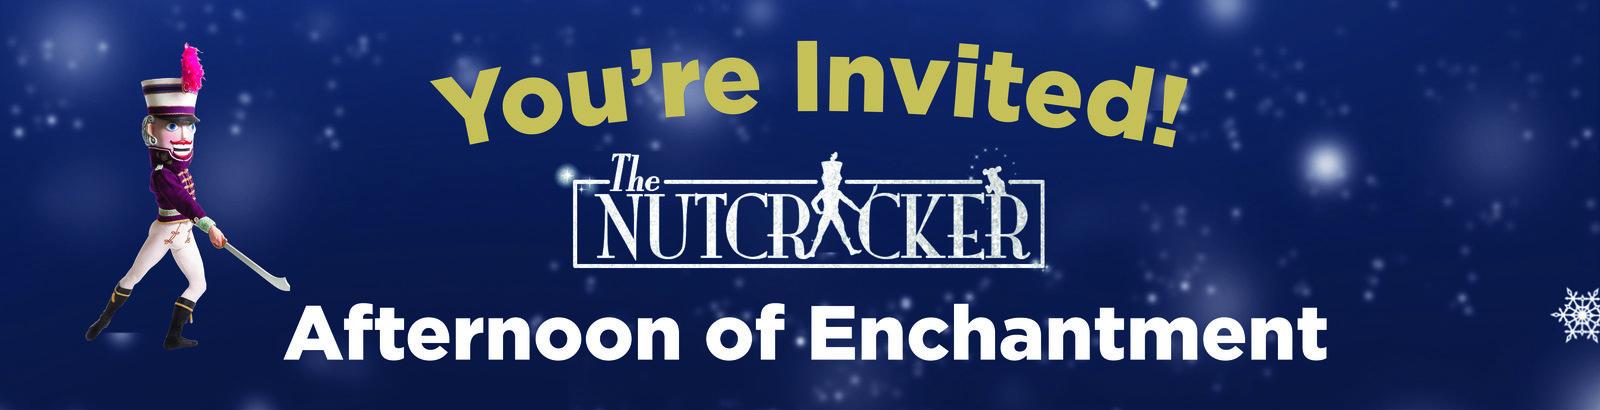 Nutcracker Events - Pittsburgh